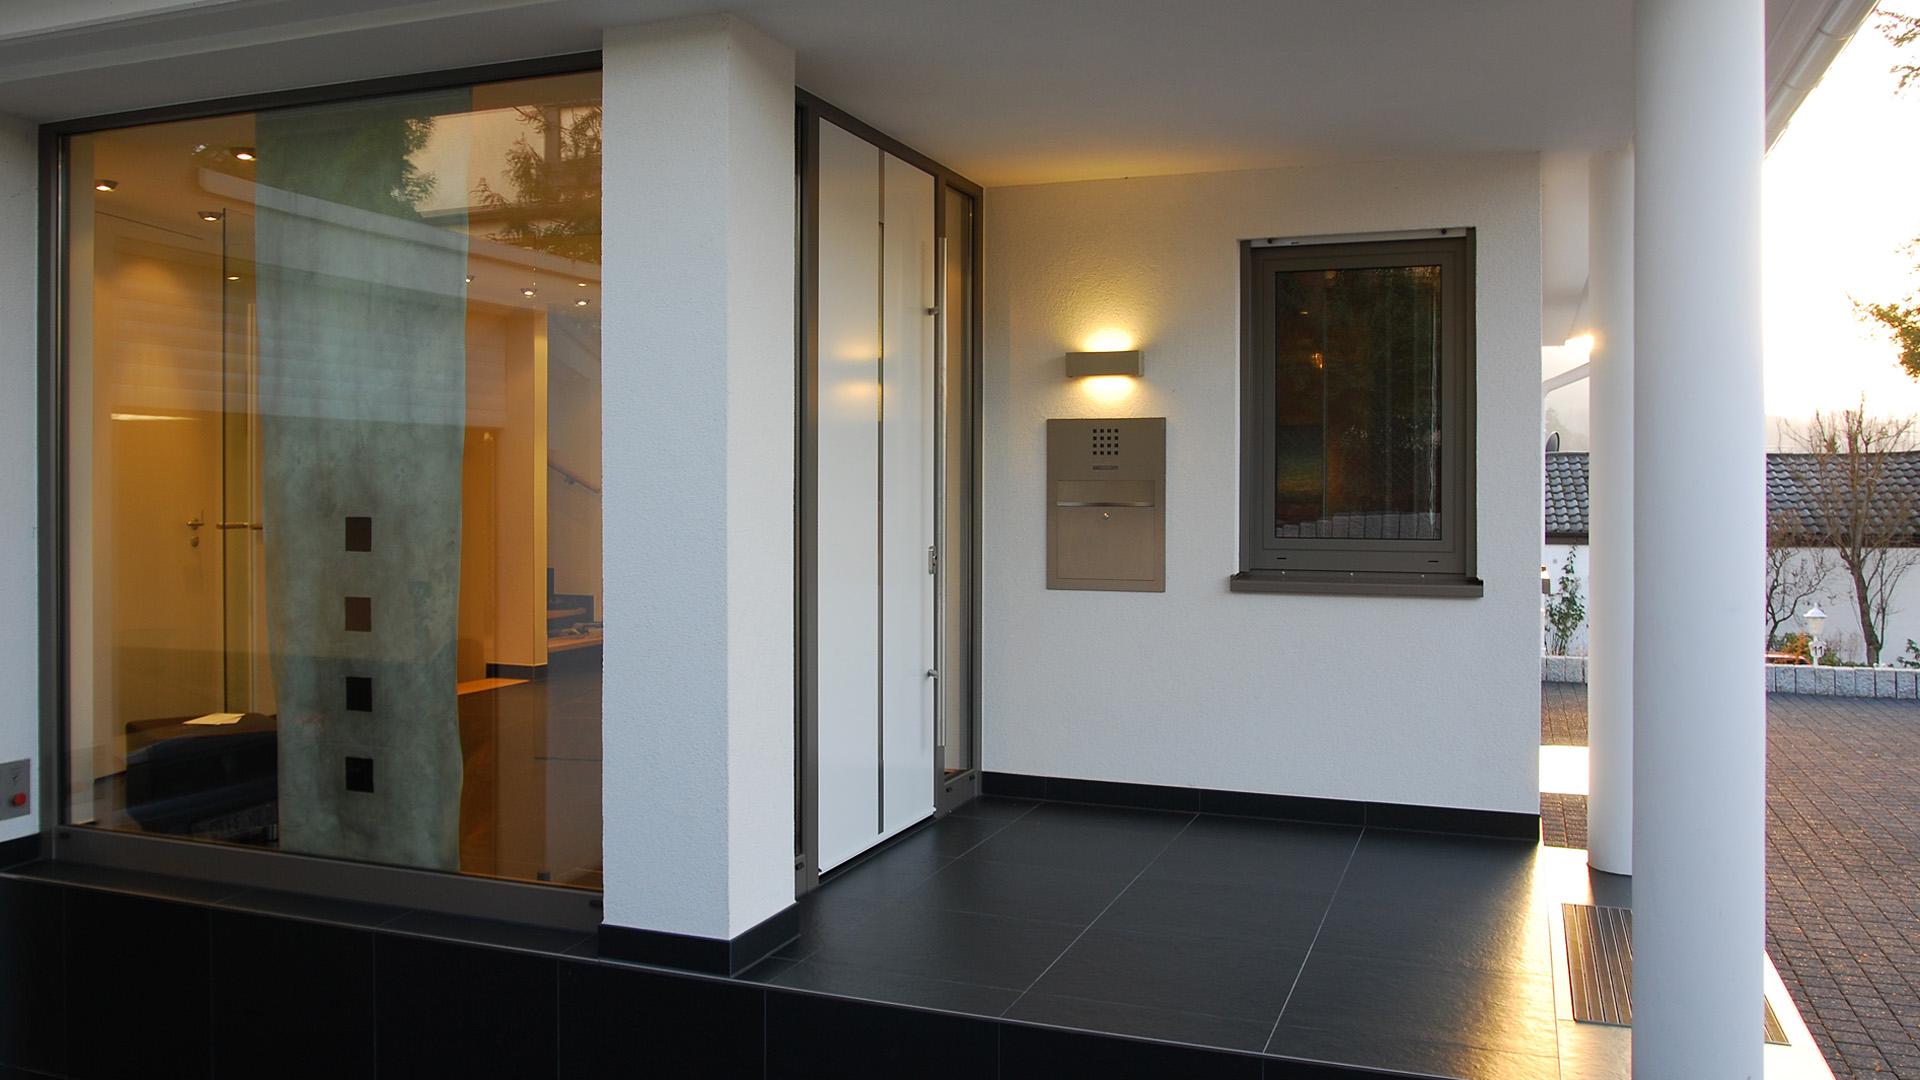 trends rund ums wohnen f r karlsruhe und umgebung rebel r ume mit charakter. Black Bedroom Furniture Sets. Home Design Ideas